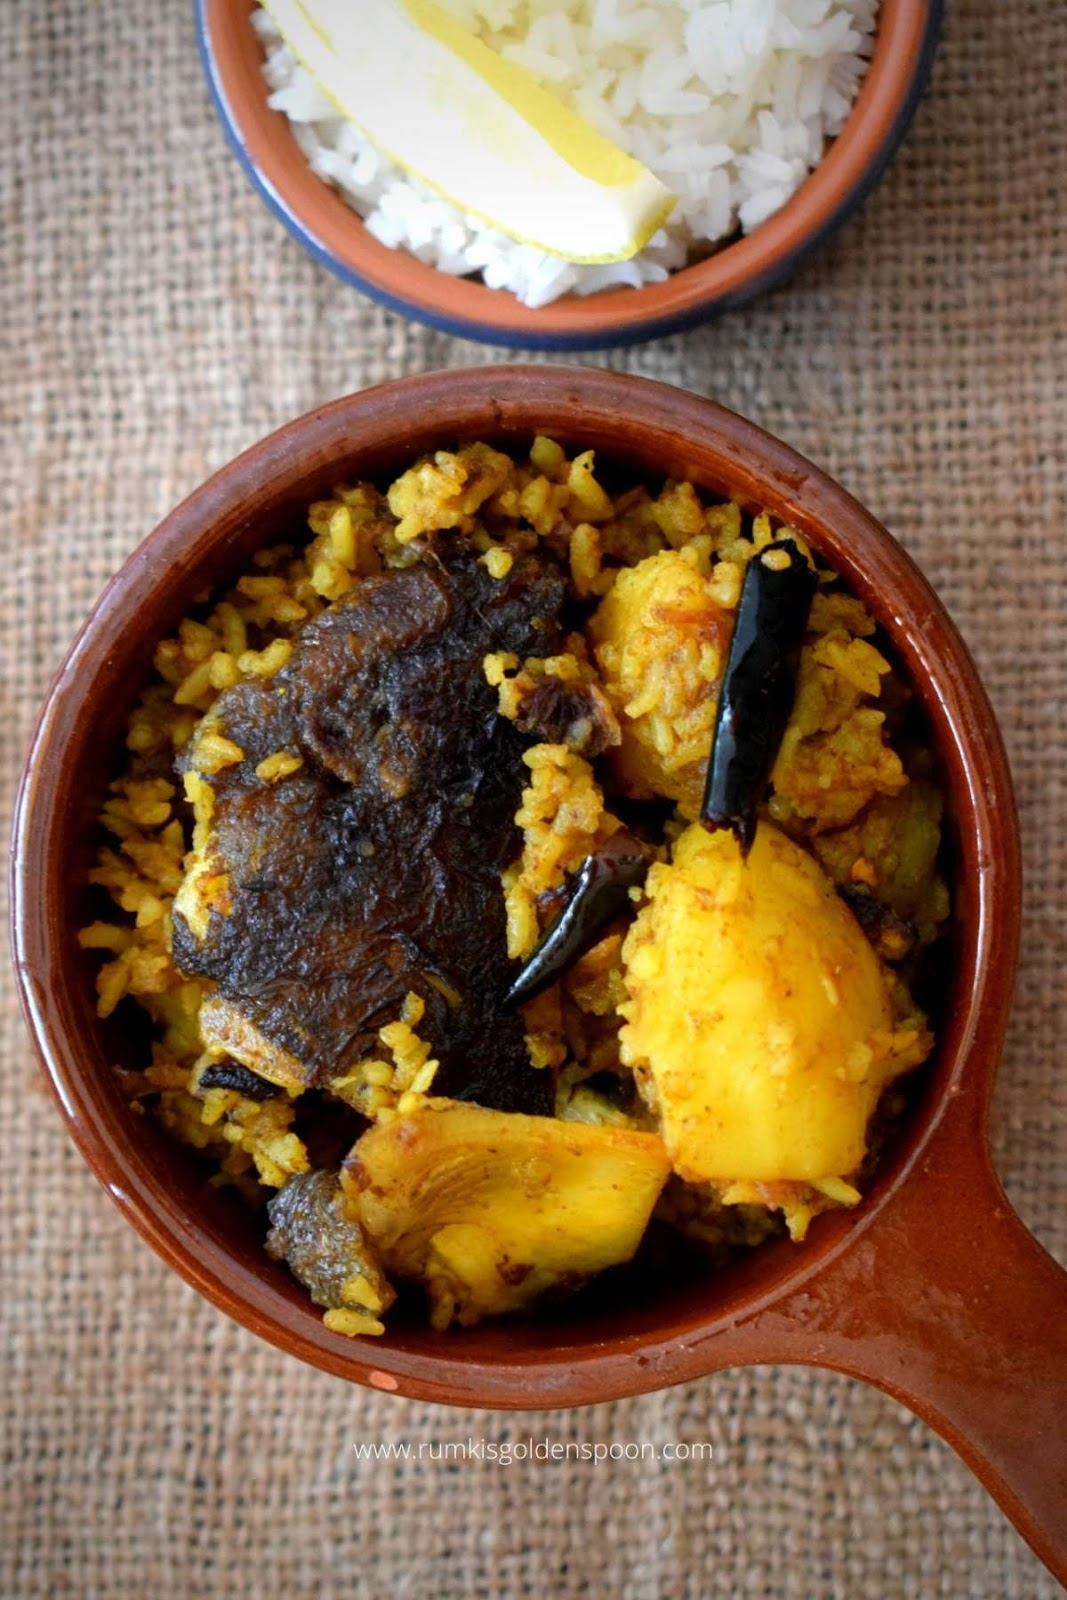 Muri Ghonto, Muri Ghonto recipe, Macher Muri Ghonto, Macher Muri Ghonto recipe, how to make Muri Ghonto, bengali traditional food, traditional food of Bengali, traditional bengali food, ghonto recipe, Indian recipe, fish head recipe, recipe for fish head, recipe for fish head curry, macher matha diye muri ghonto recipe , macher matha diye recipe, macher matha recipe, bengali recipe fish, bengali recipe, Bengali recipes fish, Bengali recipe for fish, Bengali recipe of fish, Rumki's Golden Spoon